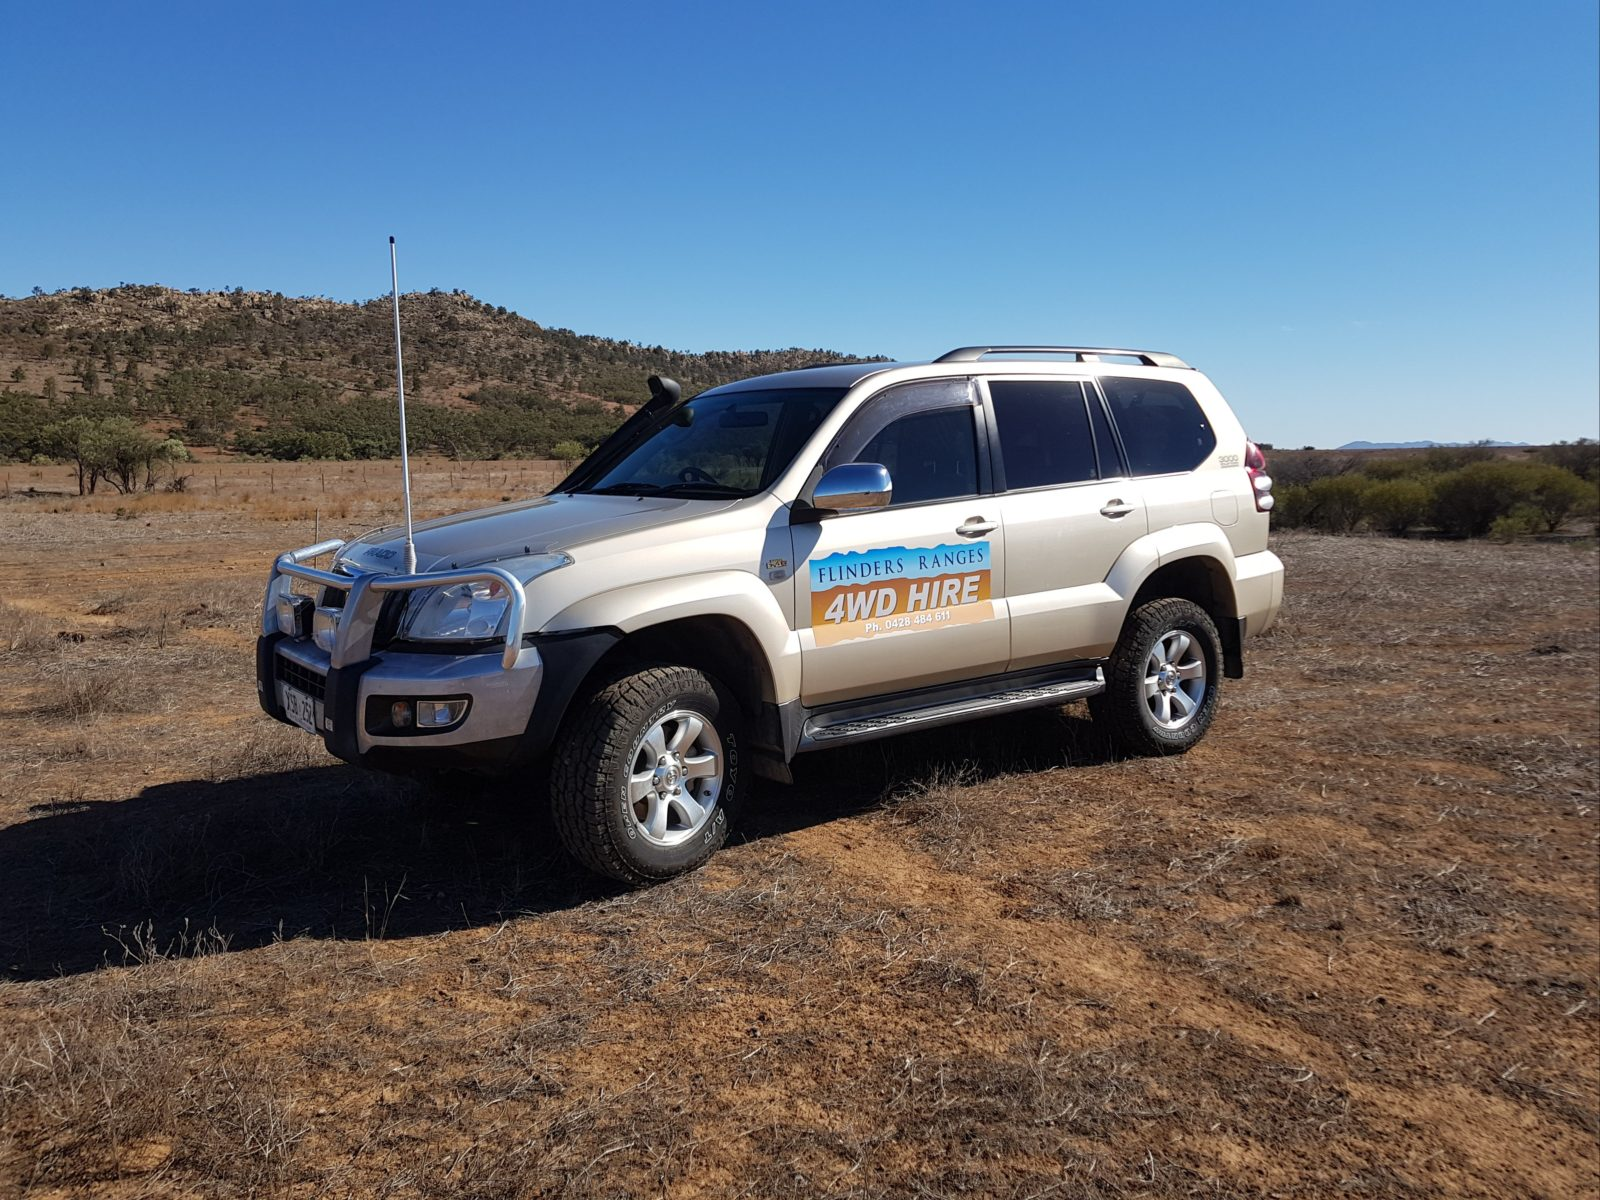 Prado Hire Vehicle